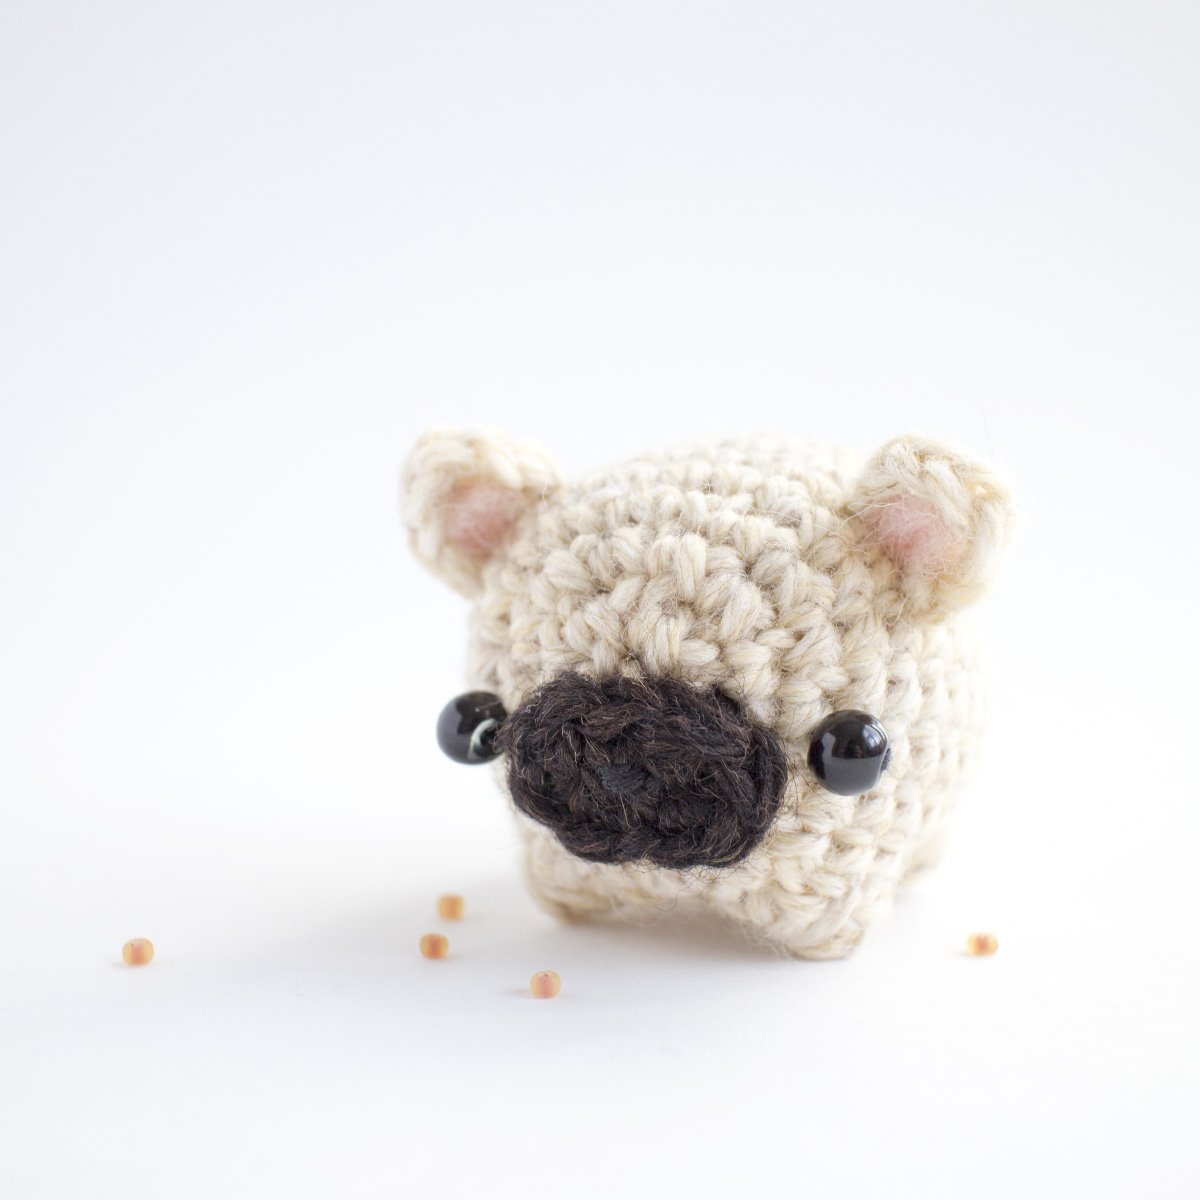 Mini Pug Personalizado (amigurumi) no Elo7 | Ateliê Pink & Purple ... | 1200x1200